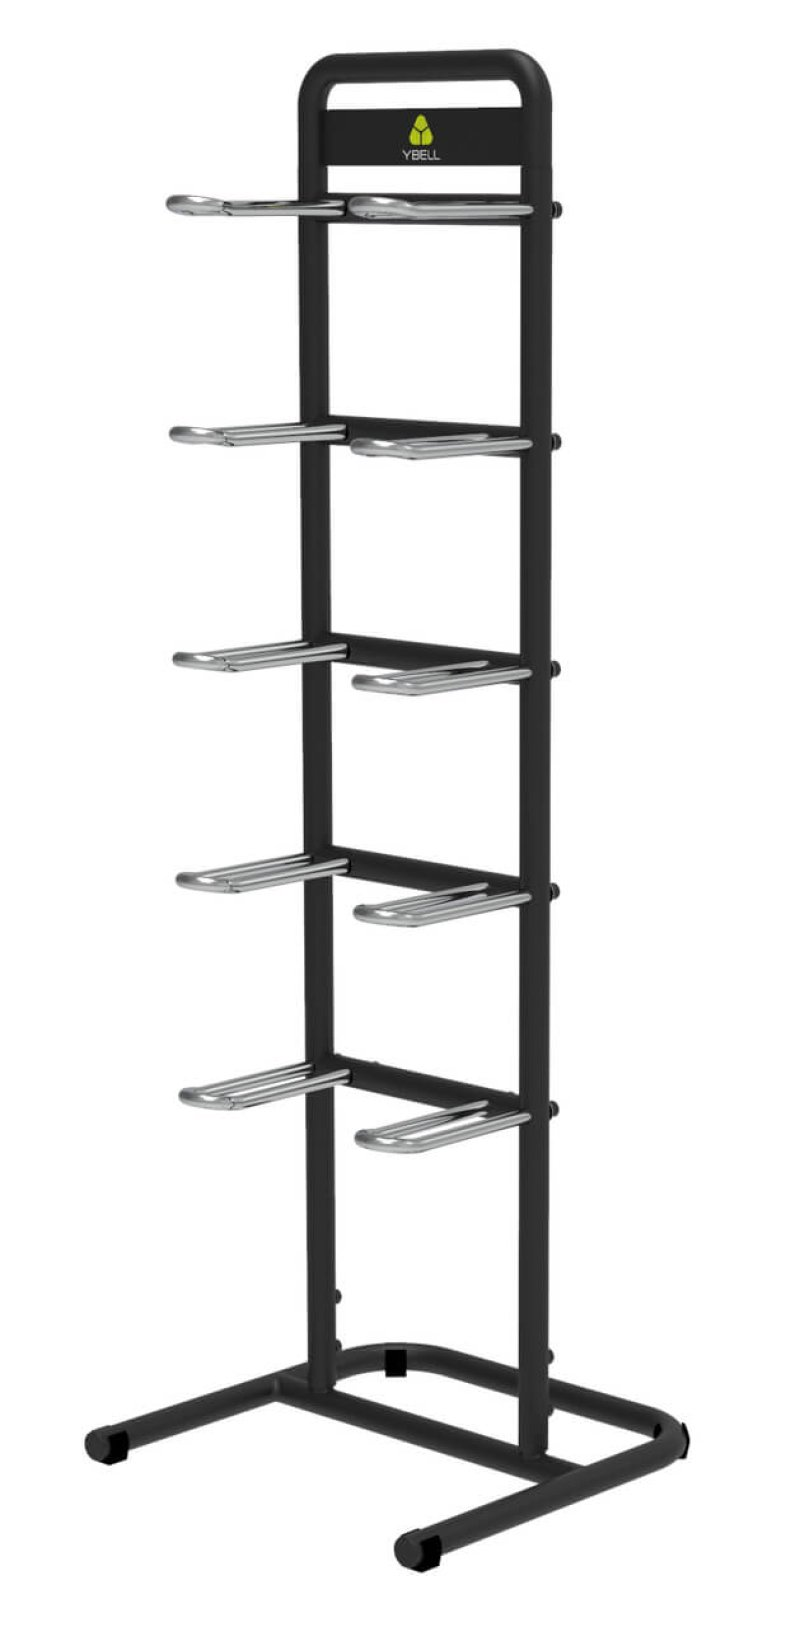 YBELL Storage Rack